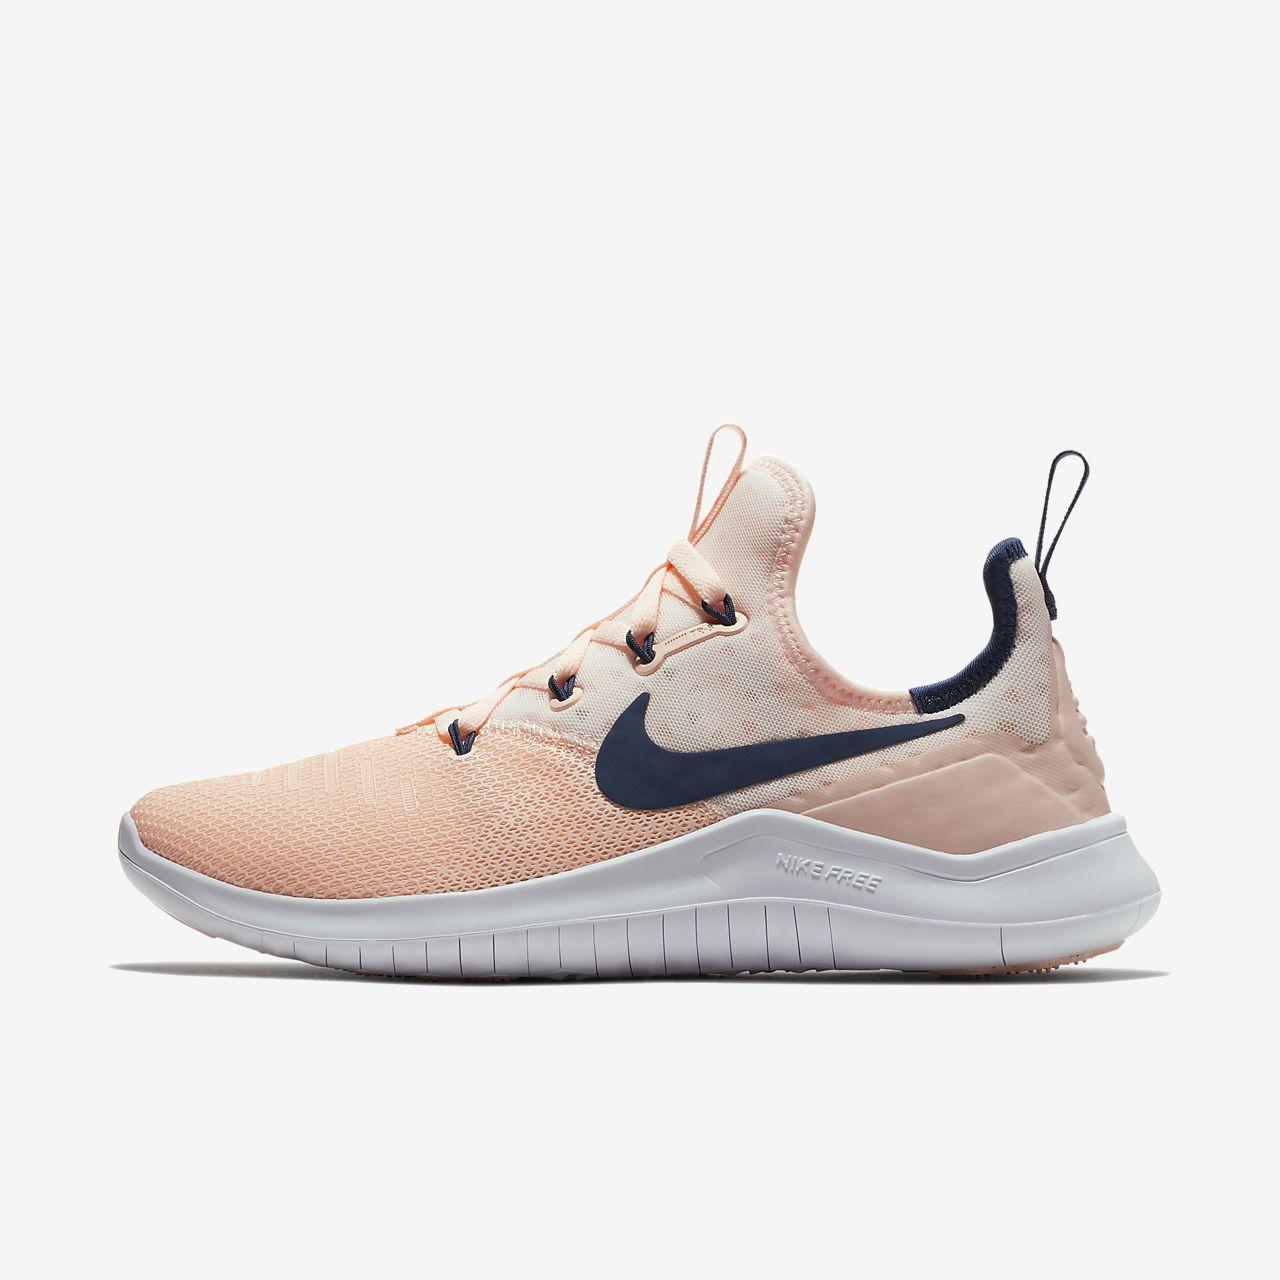 be52c325571e ... official store nike free tr8 womens gym hiit cross training shoe 157e1  35694 ...